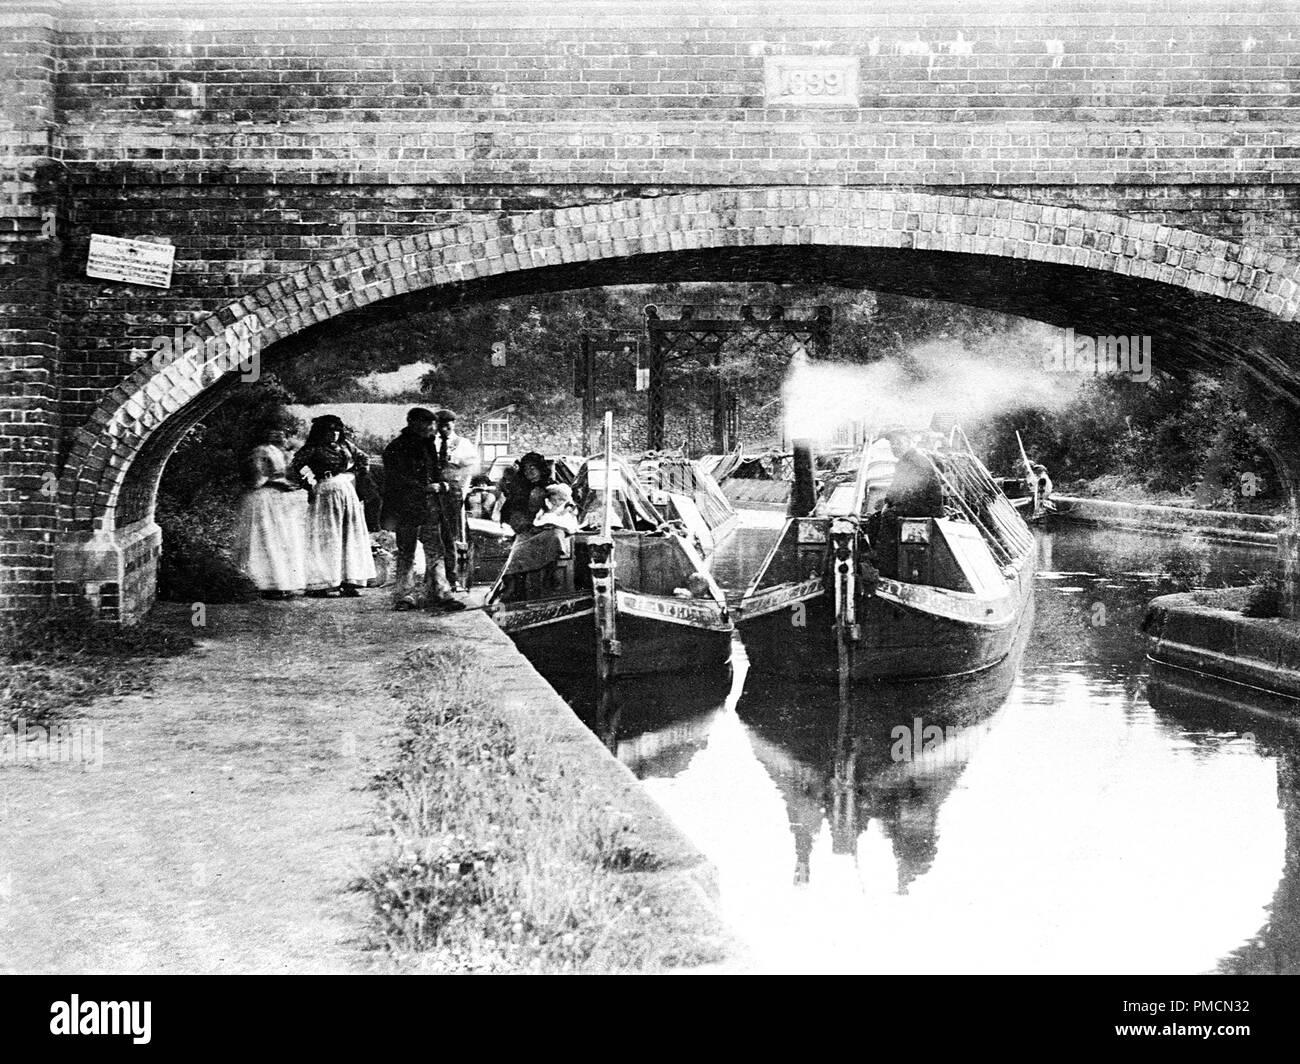 Foxton Locks, Market Harborough, early 1900s - Stock Image